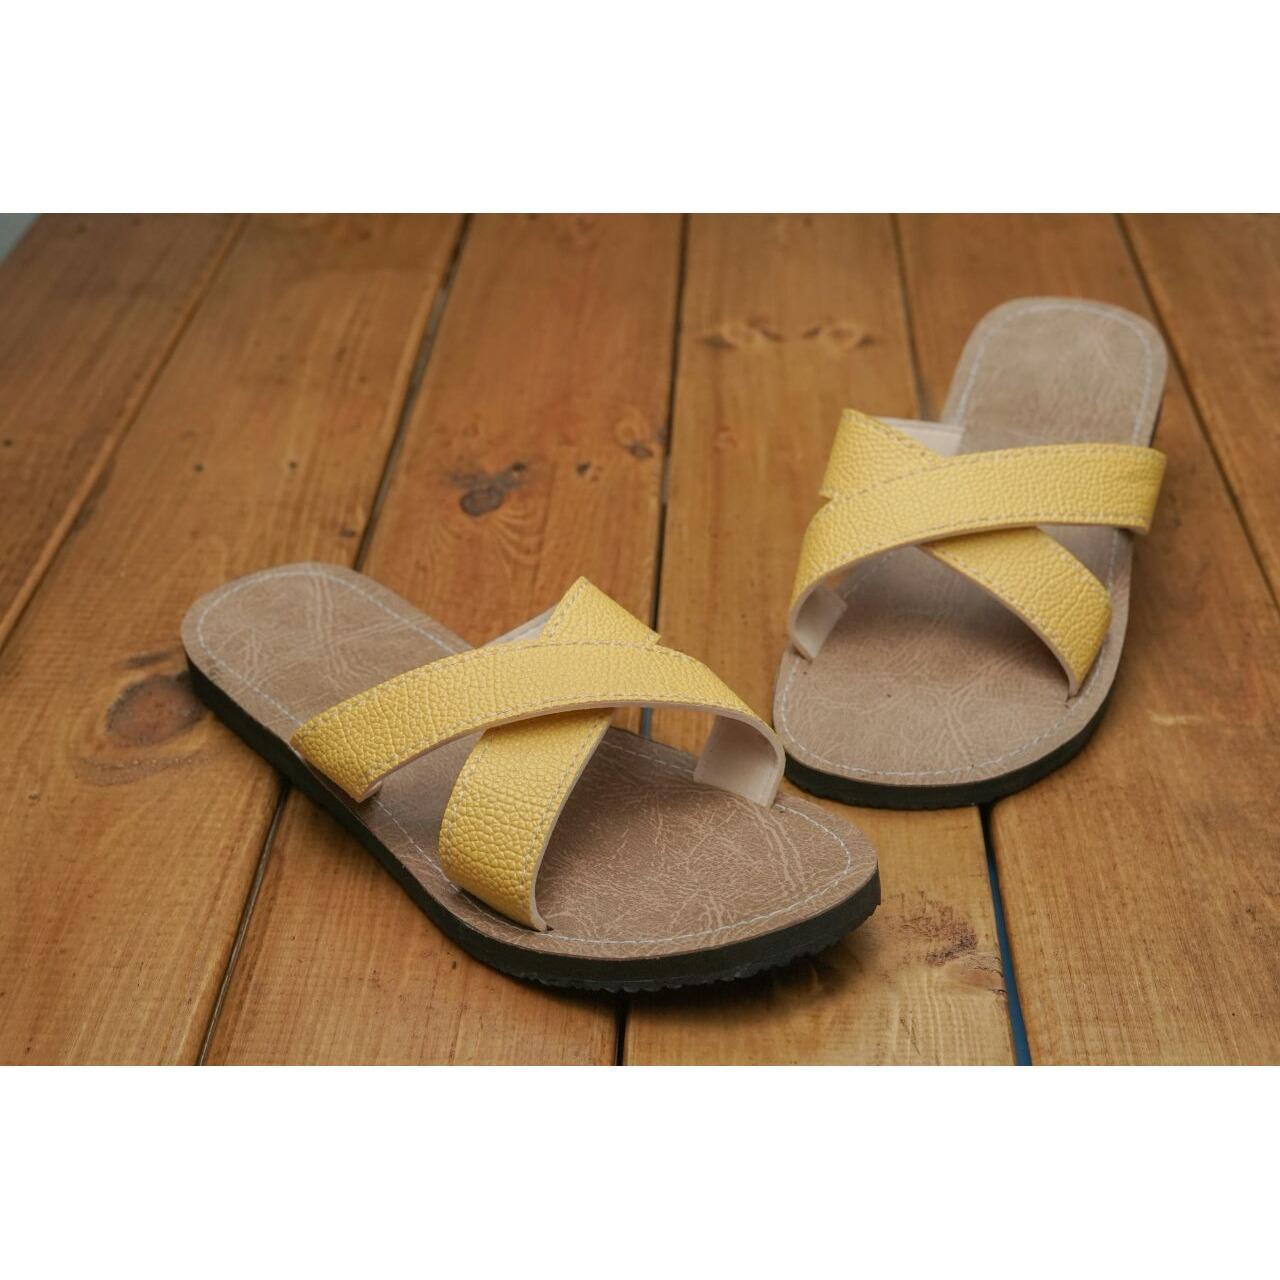 Sandal flet wanita / Sandal wanita etnik Sandal kulit wanita / Sandal wanita etnik / Sandal wanita murah